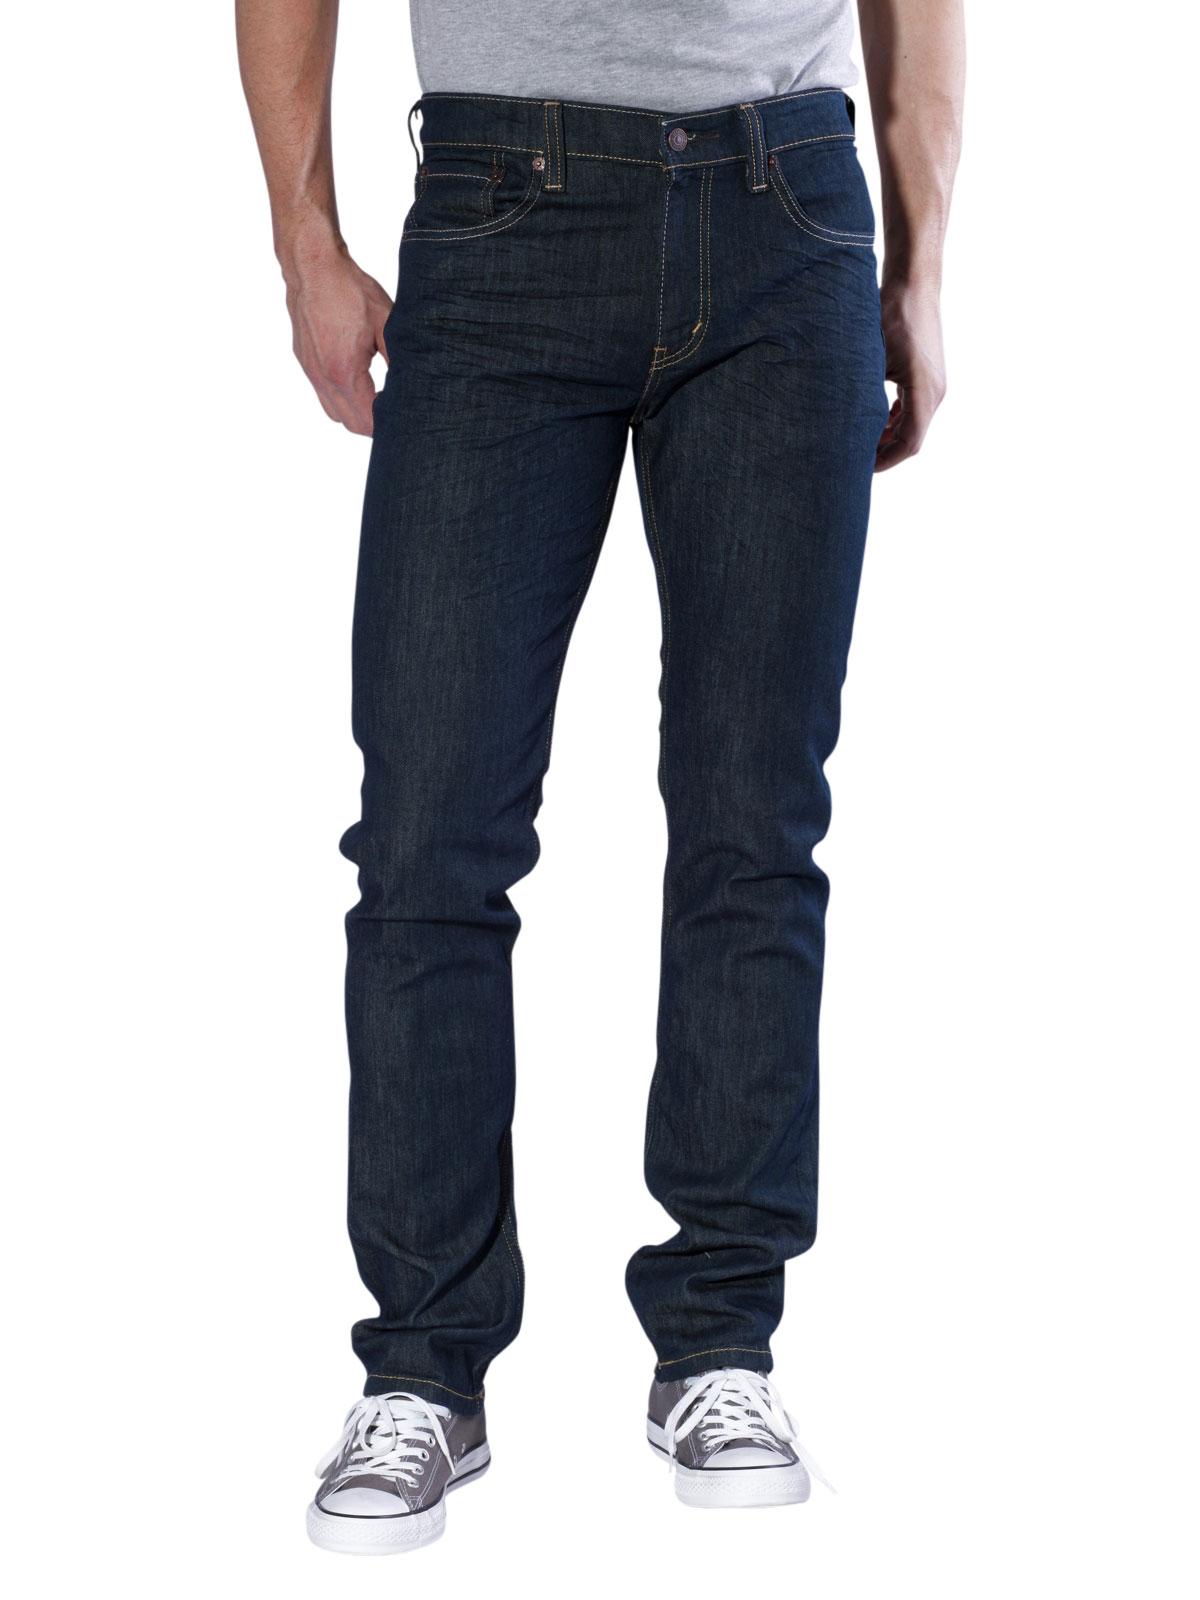 levi 39 s 511 jeans rinsed playa levi 39 s men 39 s jeans free. Black Bedroom Furniture Sets. Home Design Ideas